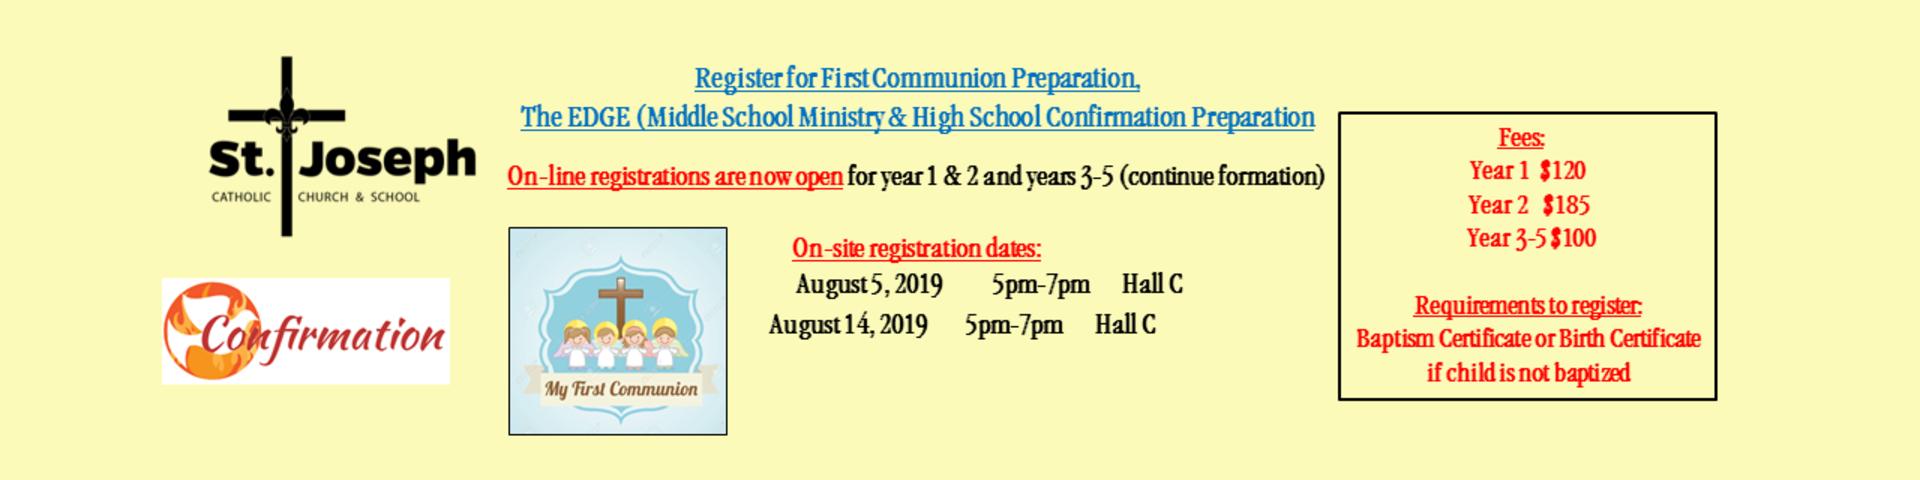 St. Joseph Catholic Church - Placentia, Ca throughout Catholic Liturgical Calendar Year C 2019-2020